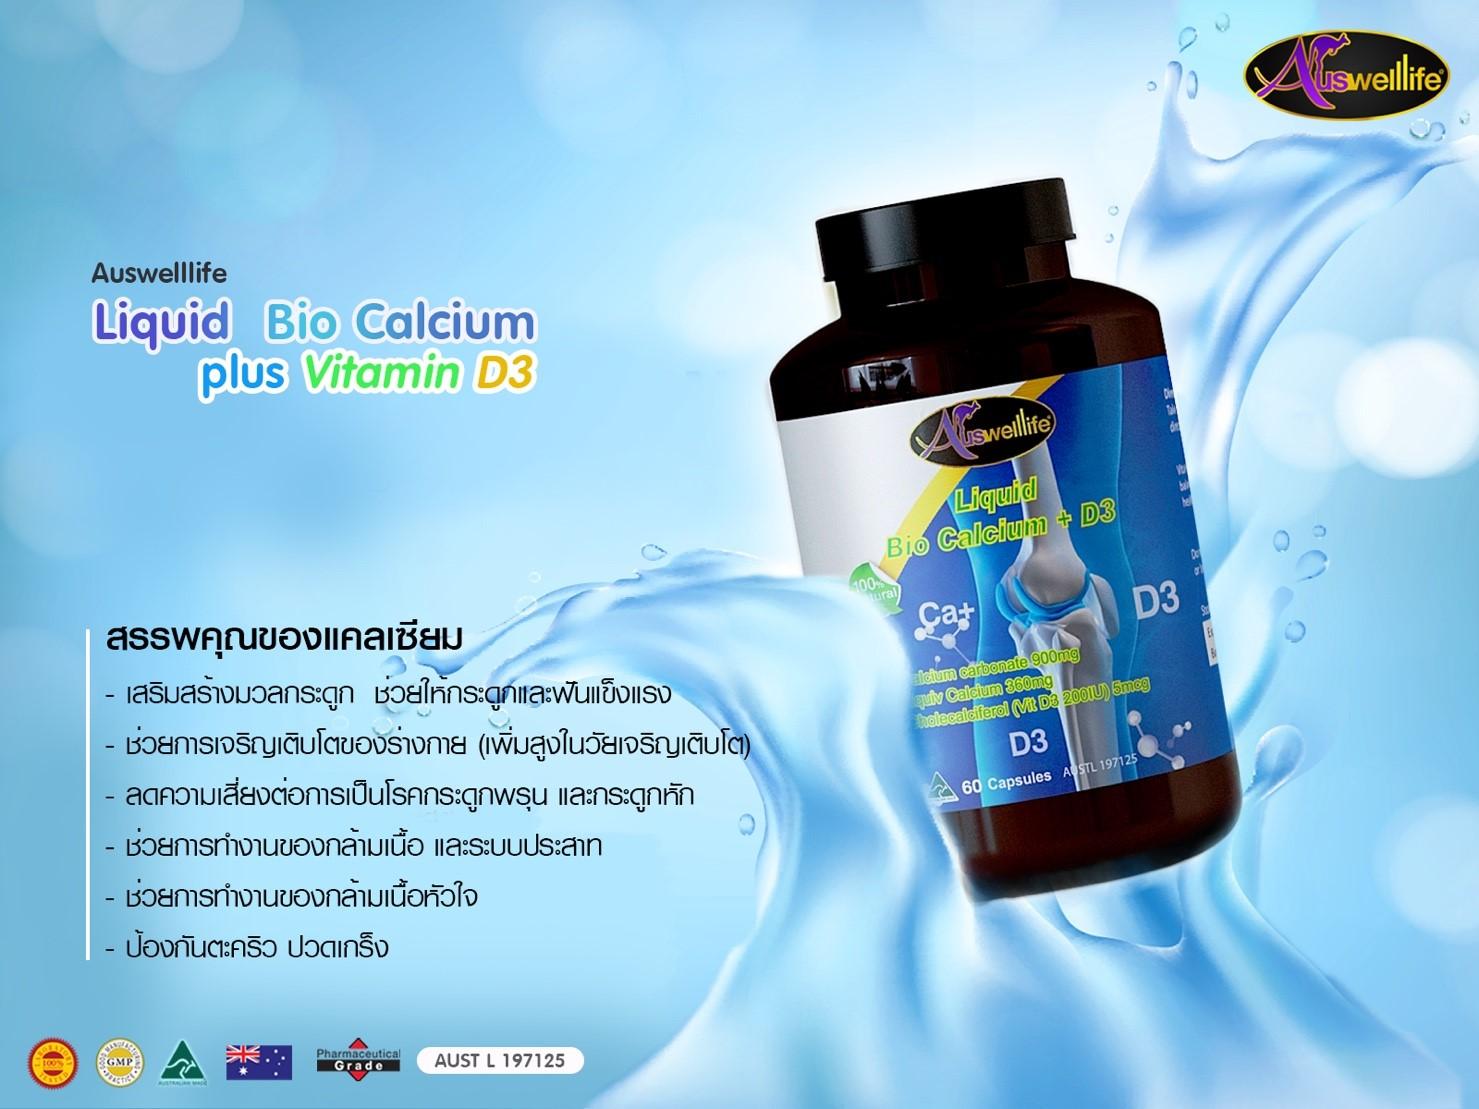 Auswelllife Liquid Bio Calcium Plus Vitamin D3 ลิควิดแคลเซียม เสริมสร้างมวลกระดูก สำเนา